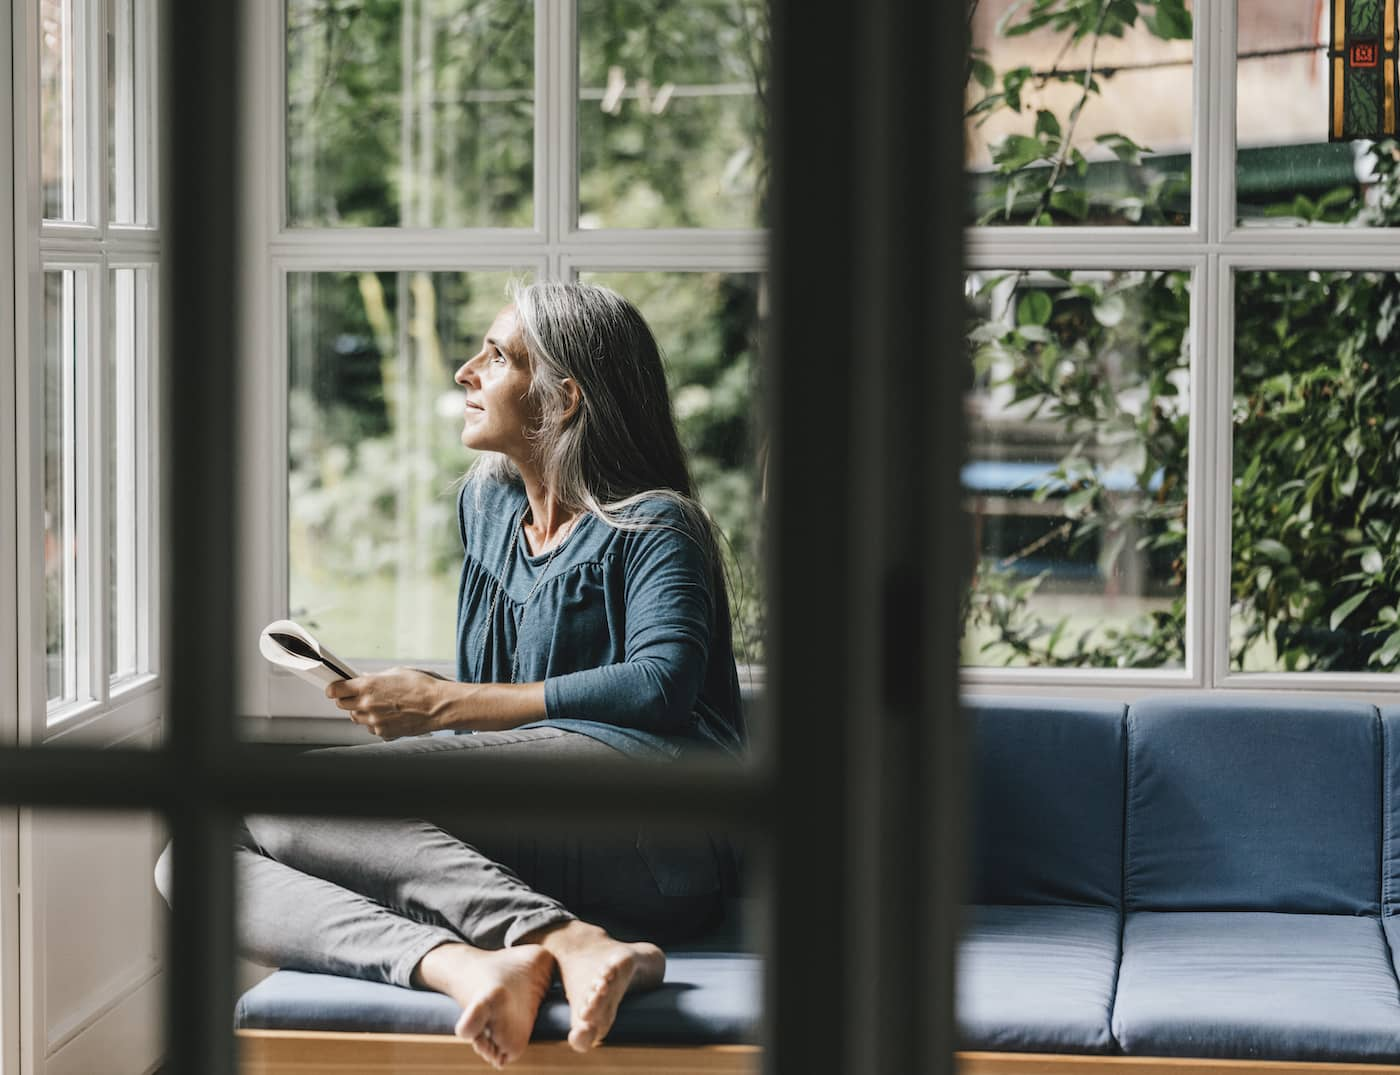 30 Best Self-Improvement Books for Those Battling Depression